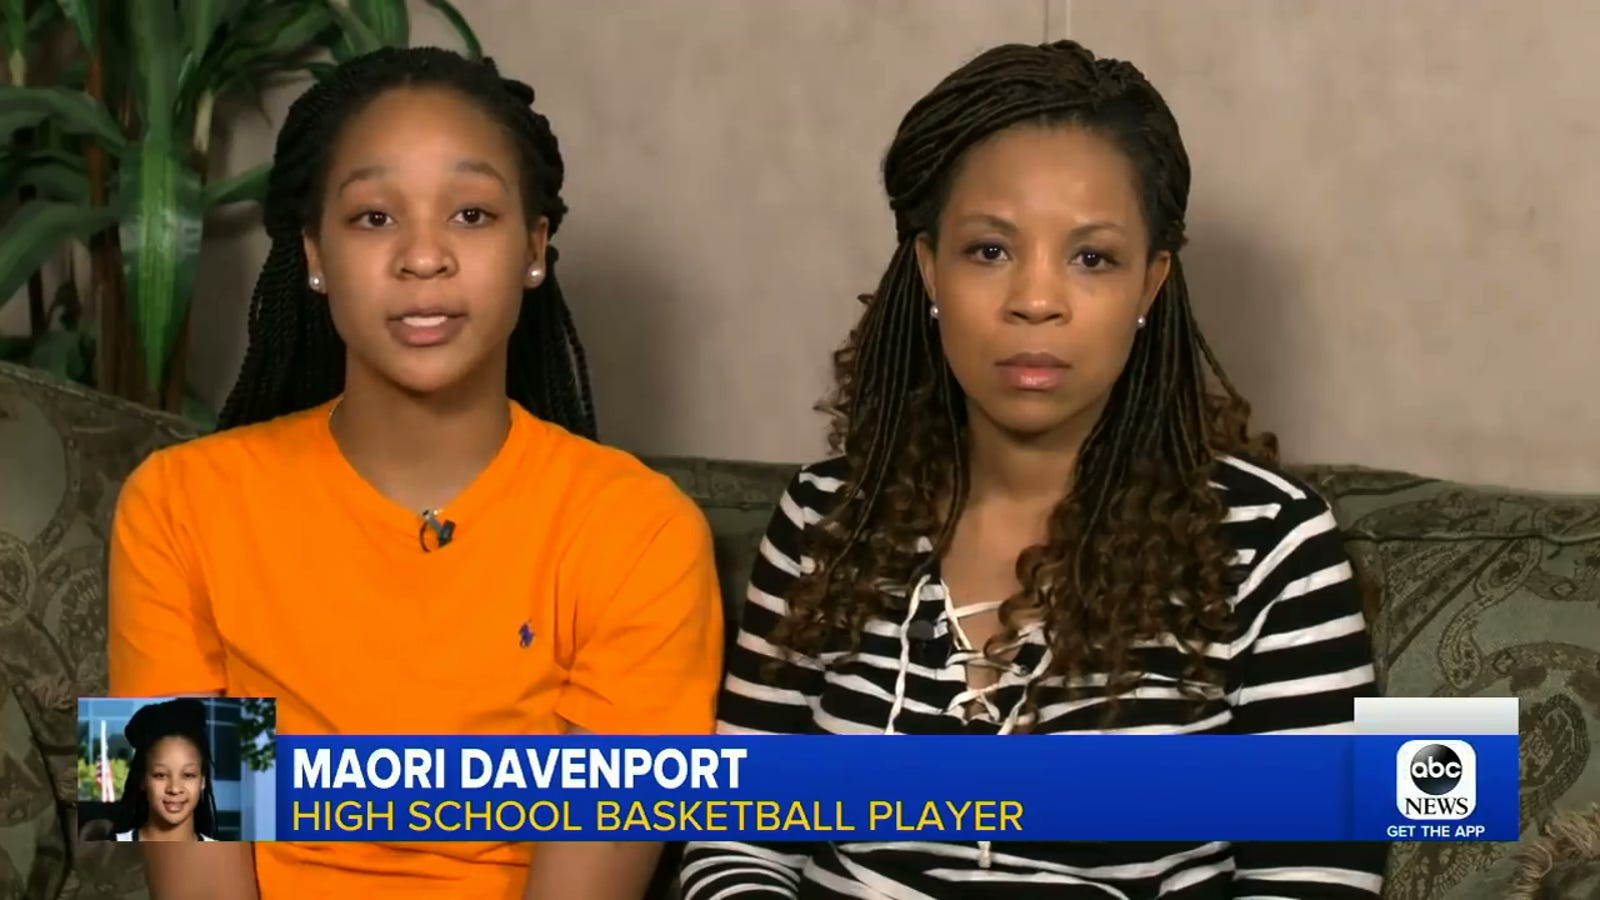 Maori Davenport, Who Was Screwed Over By USA Basketball's Mistake, Can Play High School Ball For Now